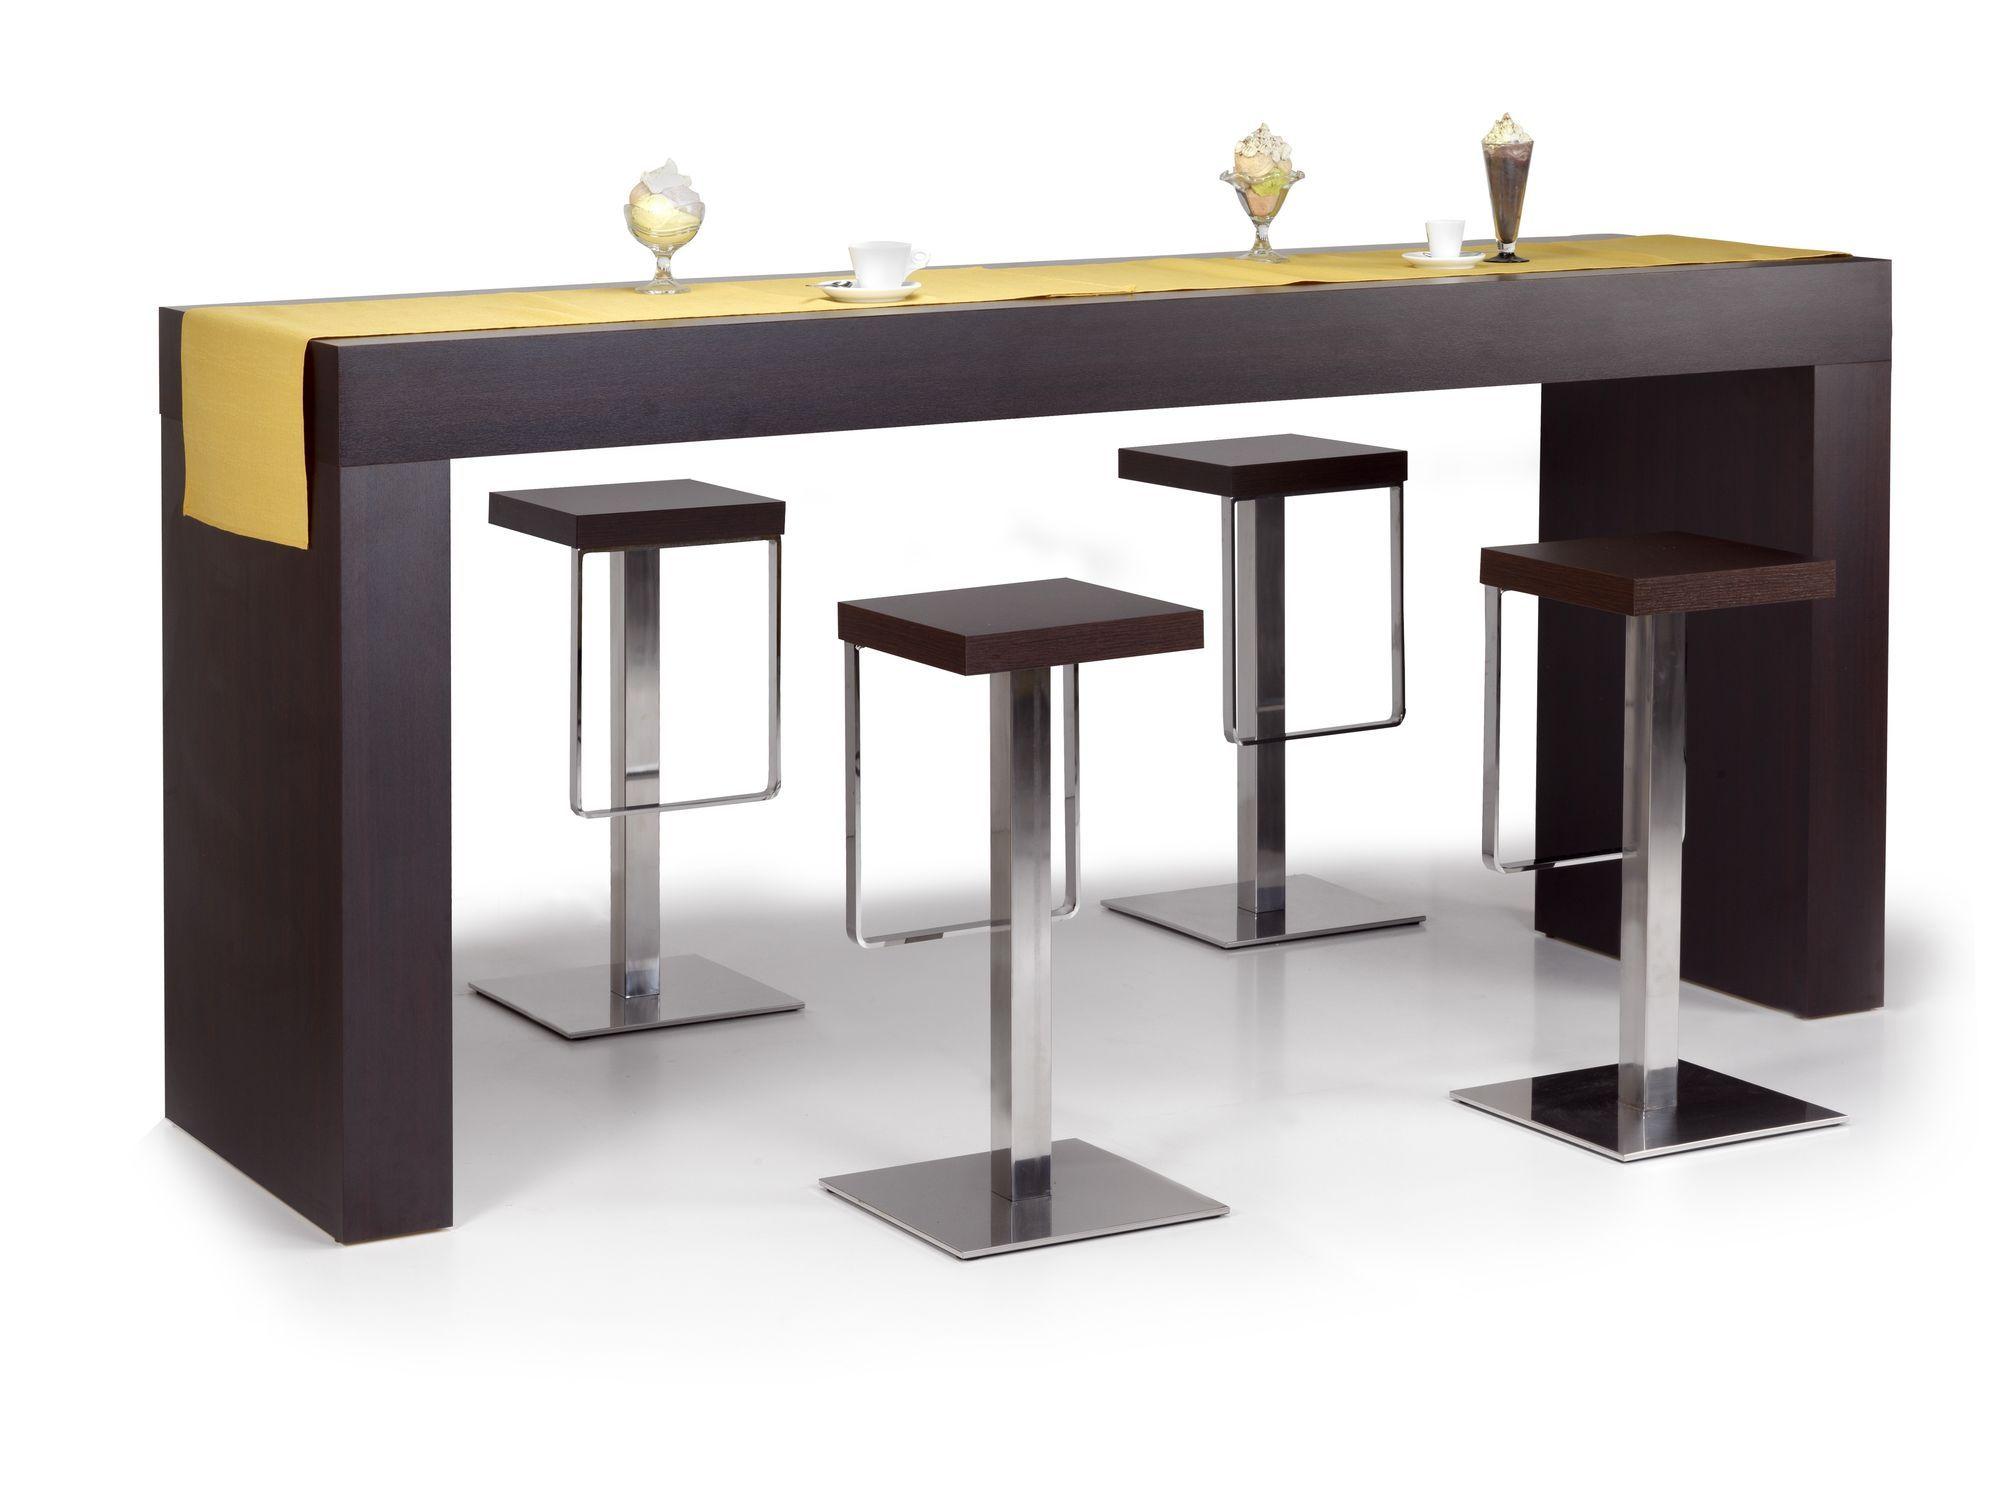 bar table my basement pinterest basements interiors. Black Bedroom Furniture Sets. Home Design Ideas